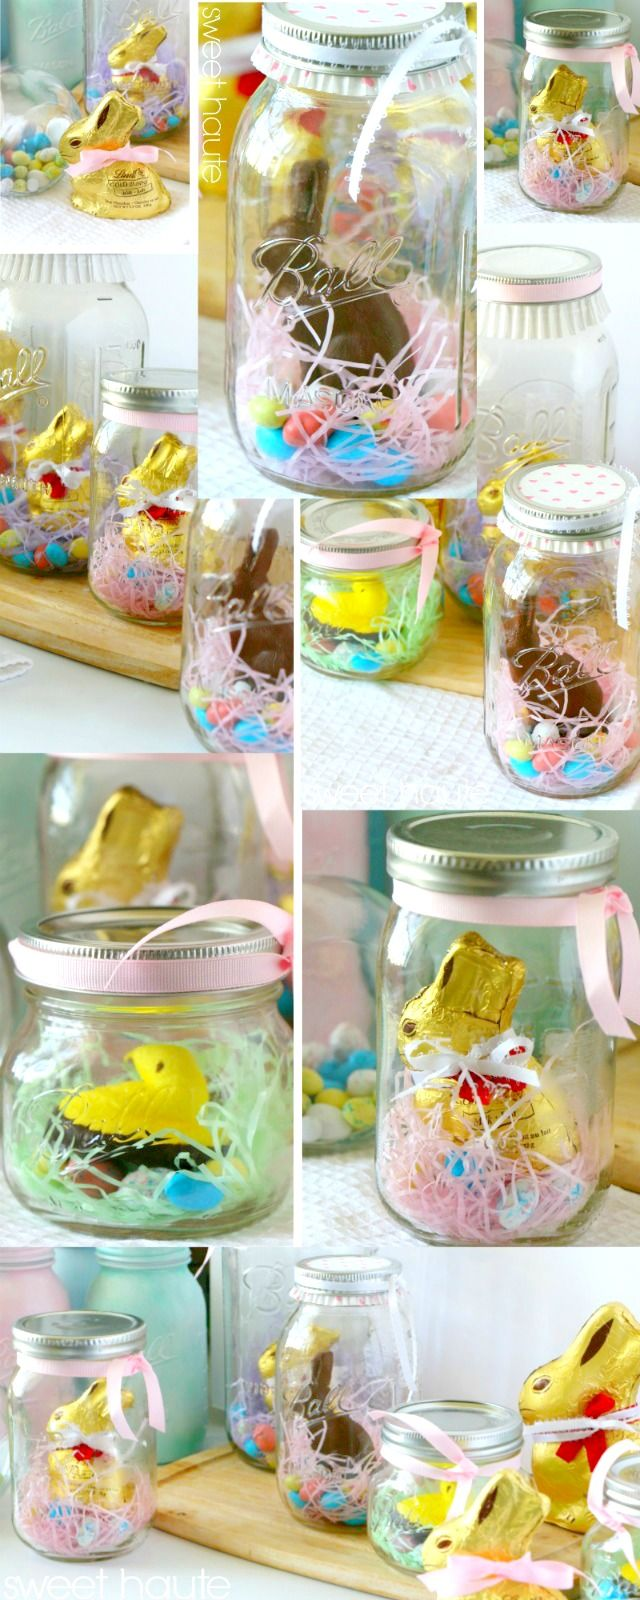 Spring DIY Home Decor ideas Easter Bunny Mason Jars- SWEET HAUTE Pin now...make later!